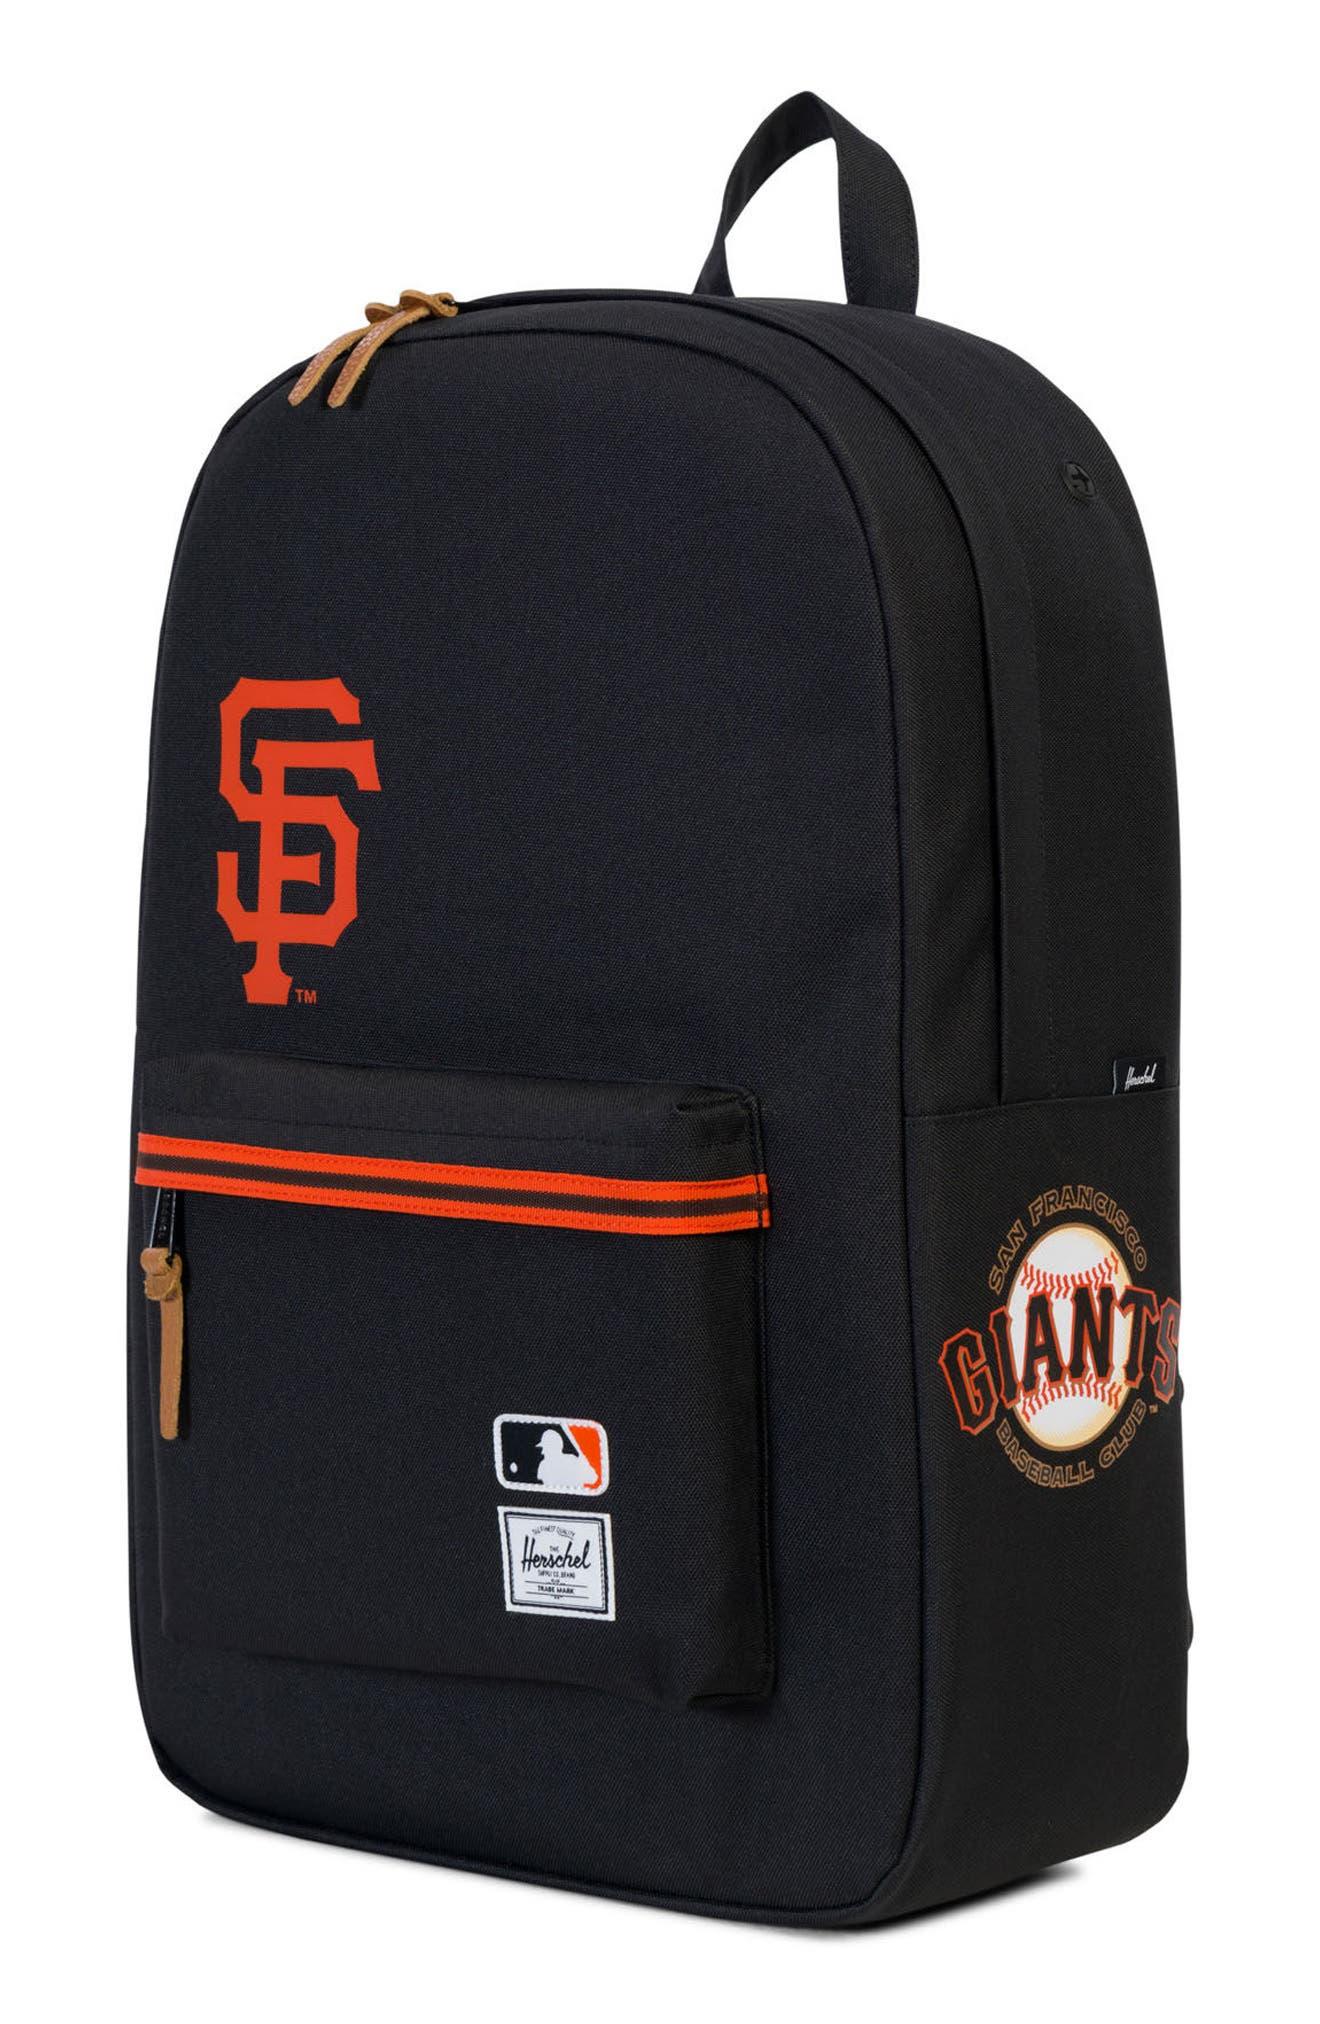 Heritage San Francisco Giants Backpack,                             Alternate thumbnail 4, color,                             008